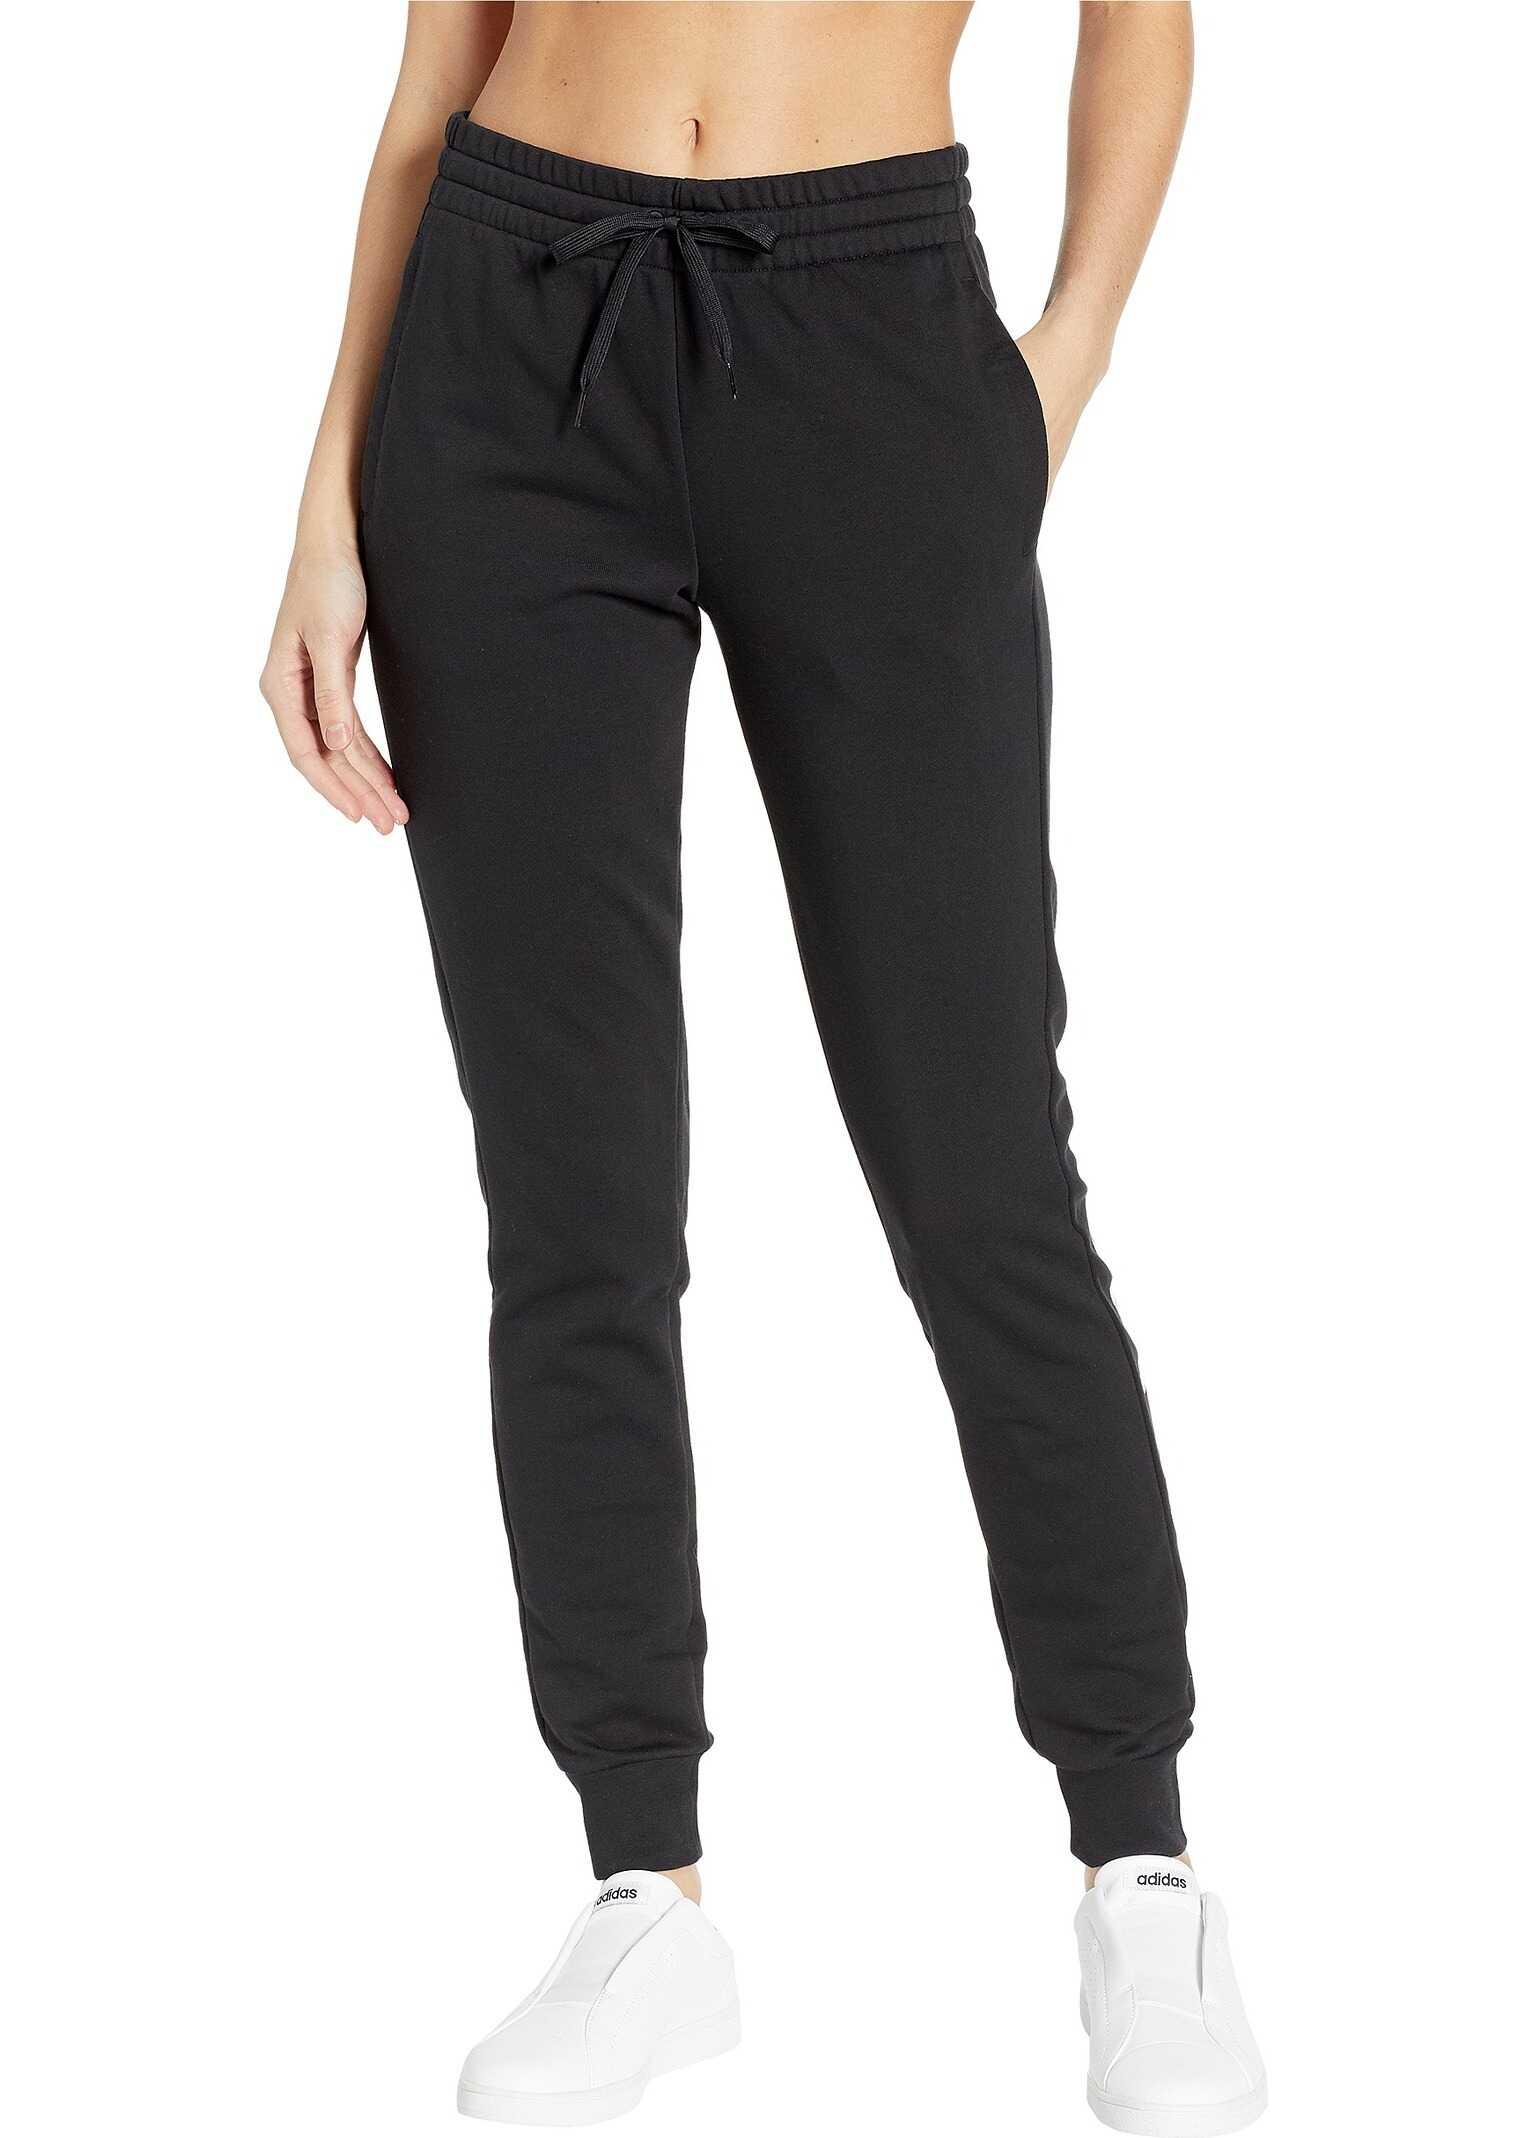 adidas Essentials Linear Pants Black/White 1